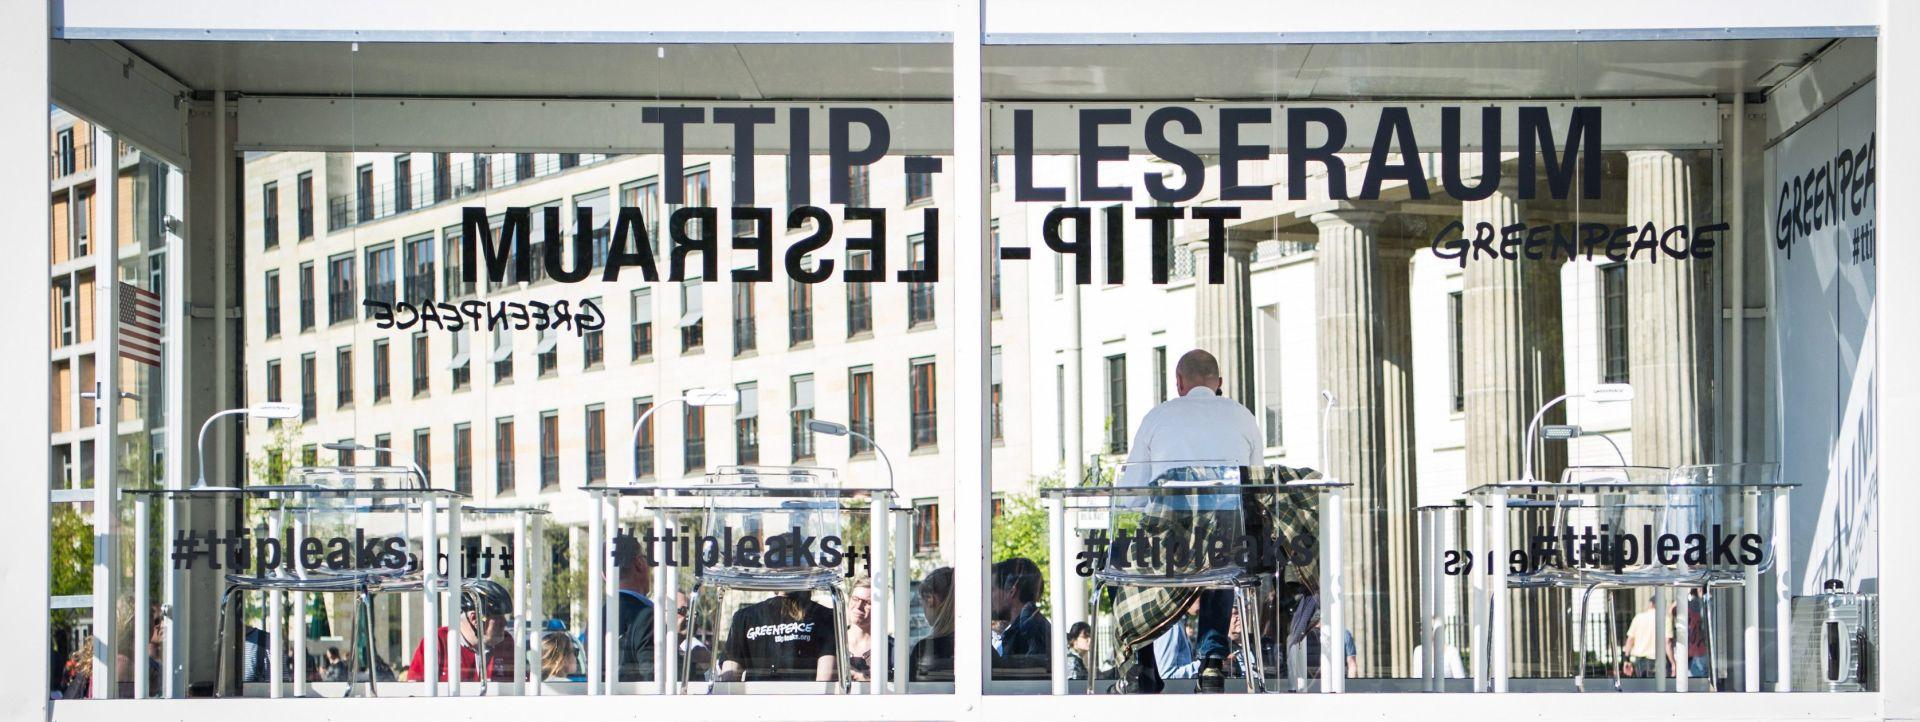 POVJERENICA ODBACILA OPTUŽBE: Europska komisija odbacuje navode Greenpeacea o TTIP-u